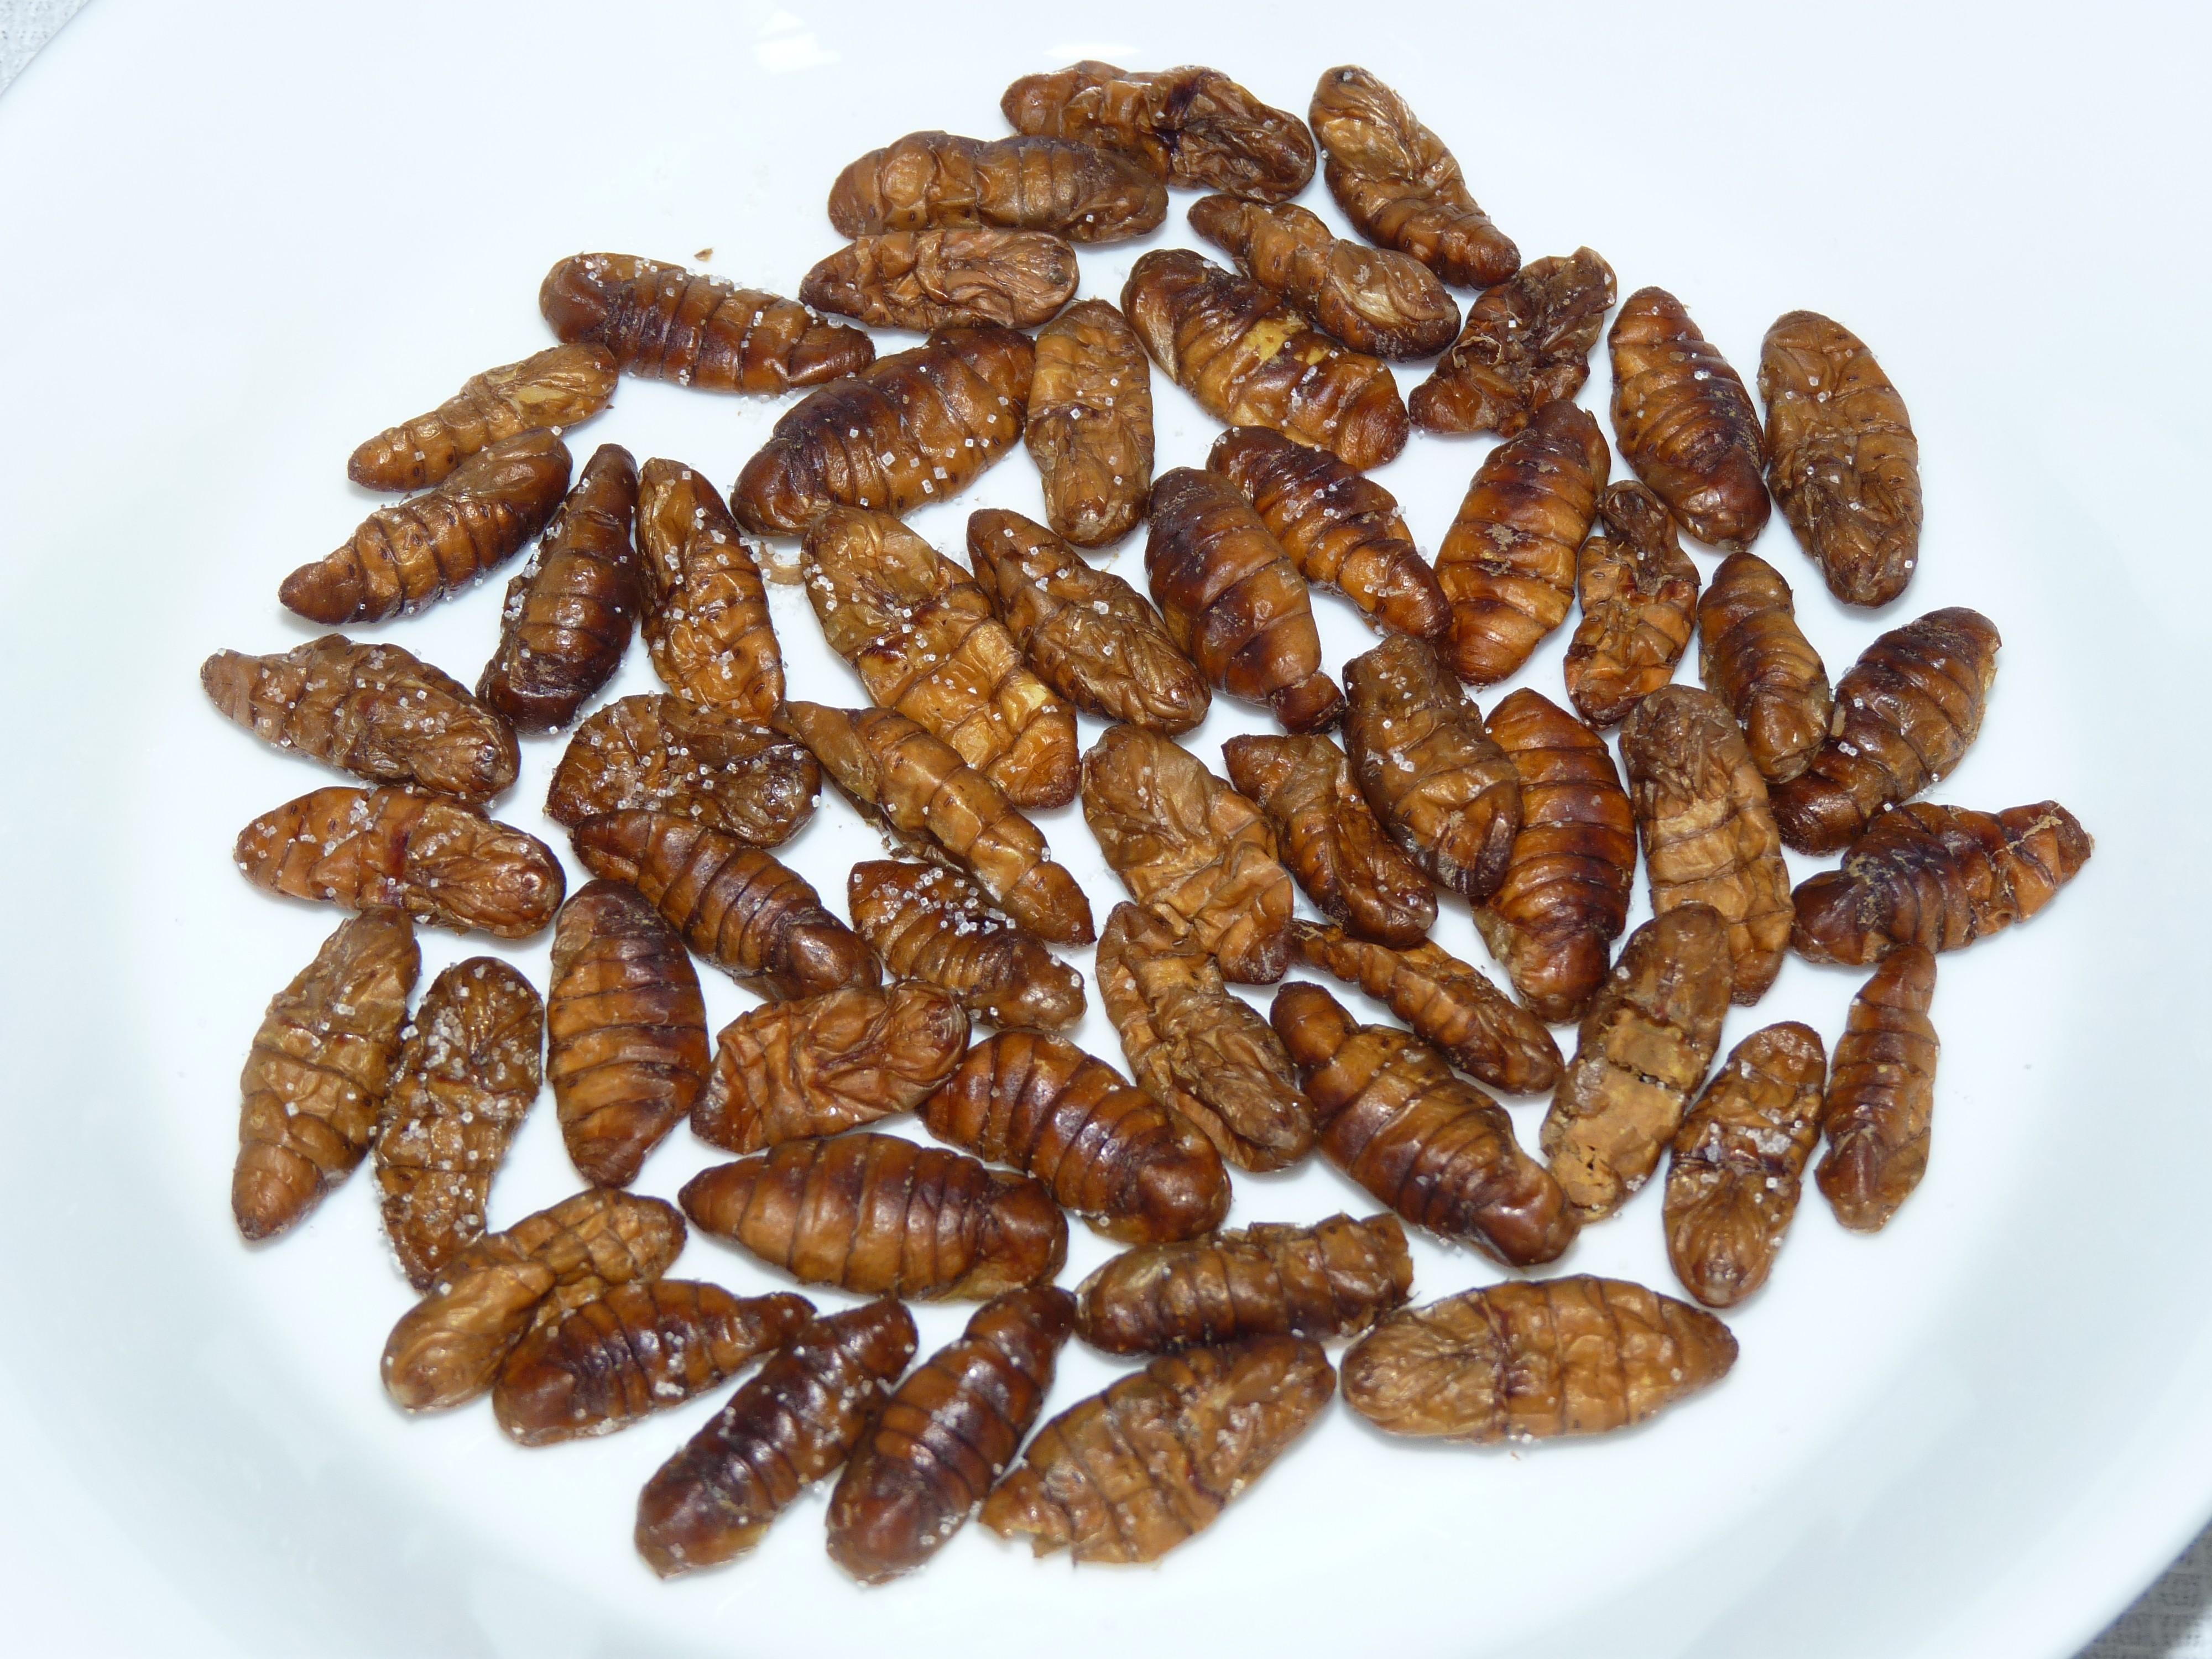 insectes comestibles ustensiles de cuisine. Black Bedroom Furniture Sets. Home Design Ideas